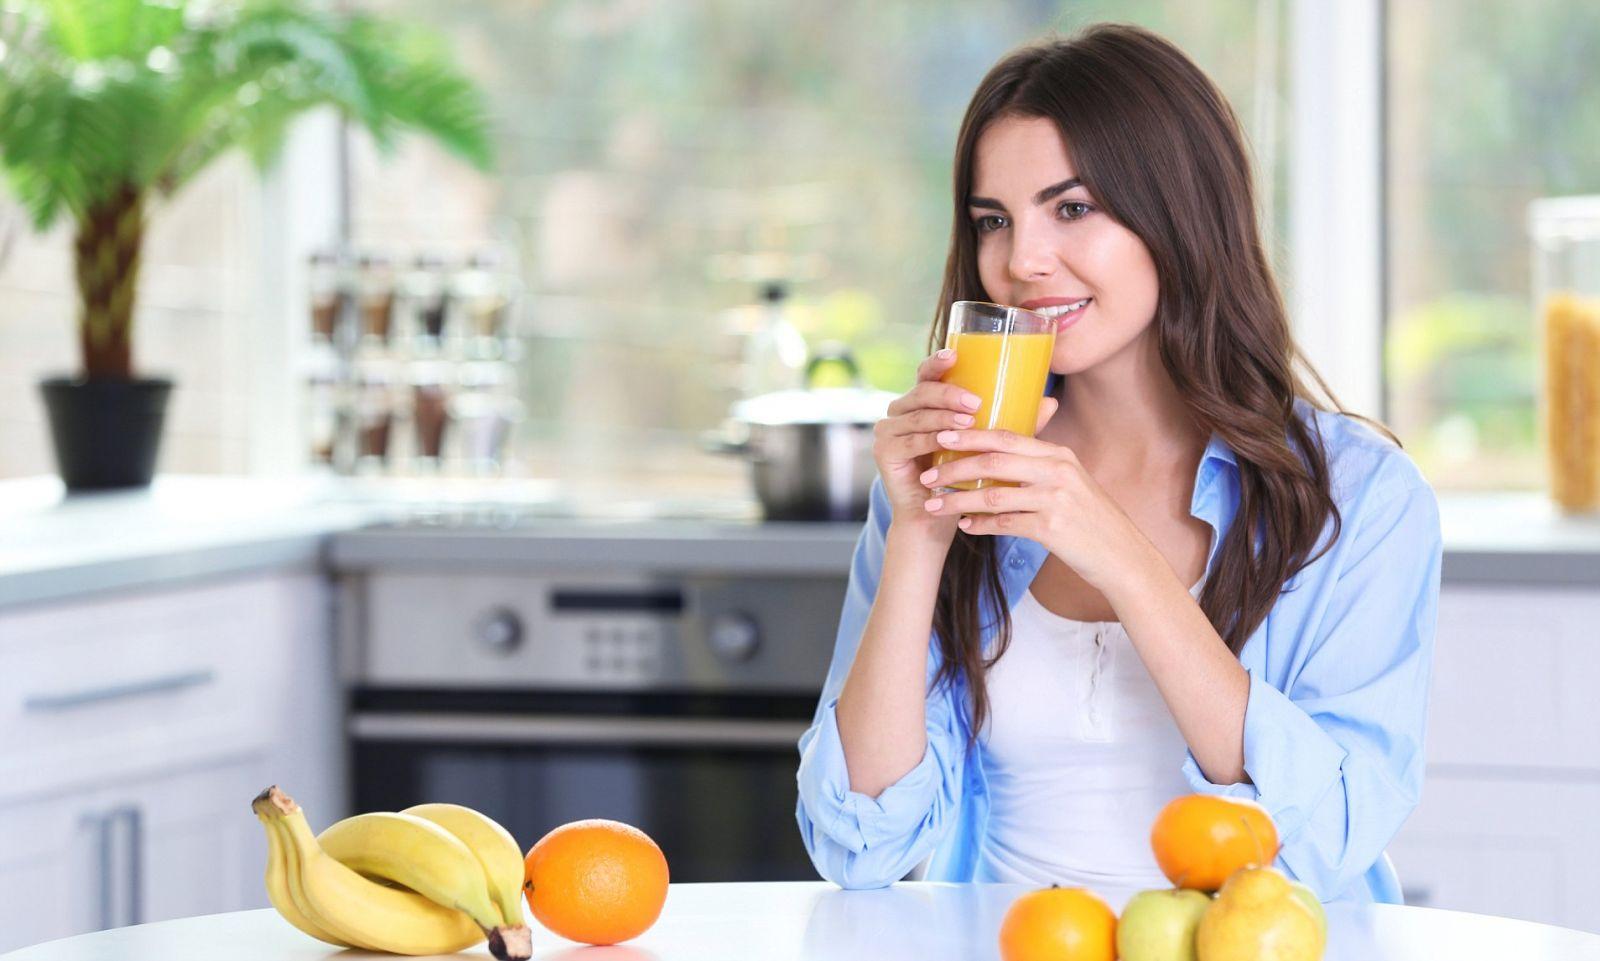 Ilustrasi minum jus buah. Foto: Shutterstock